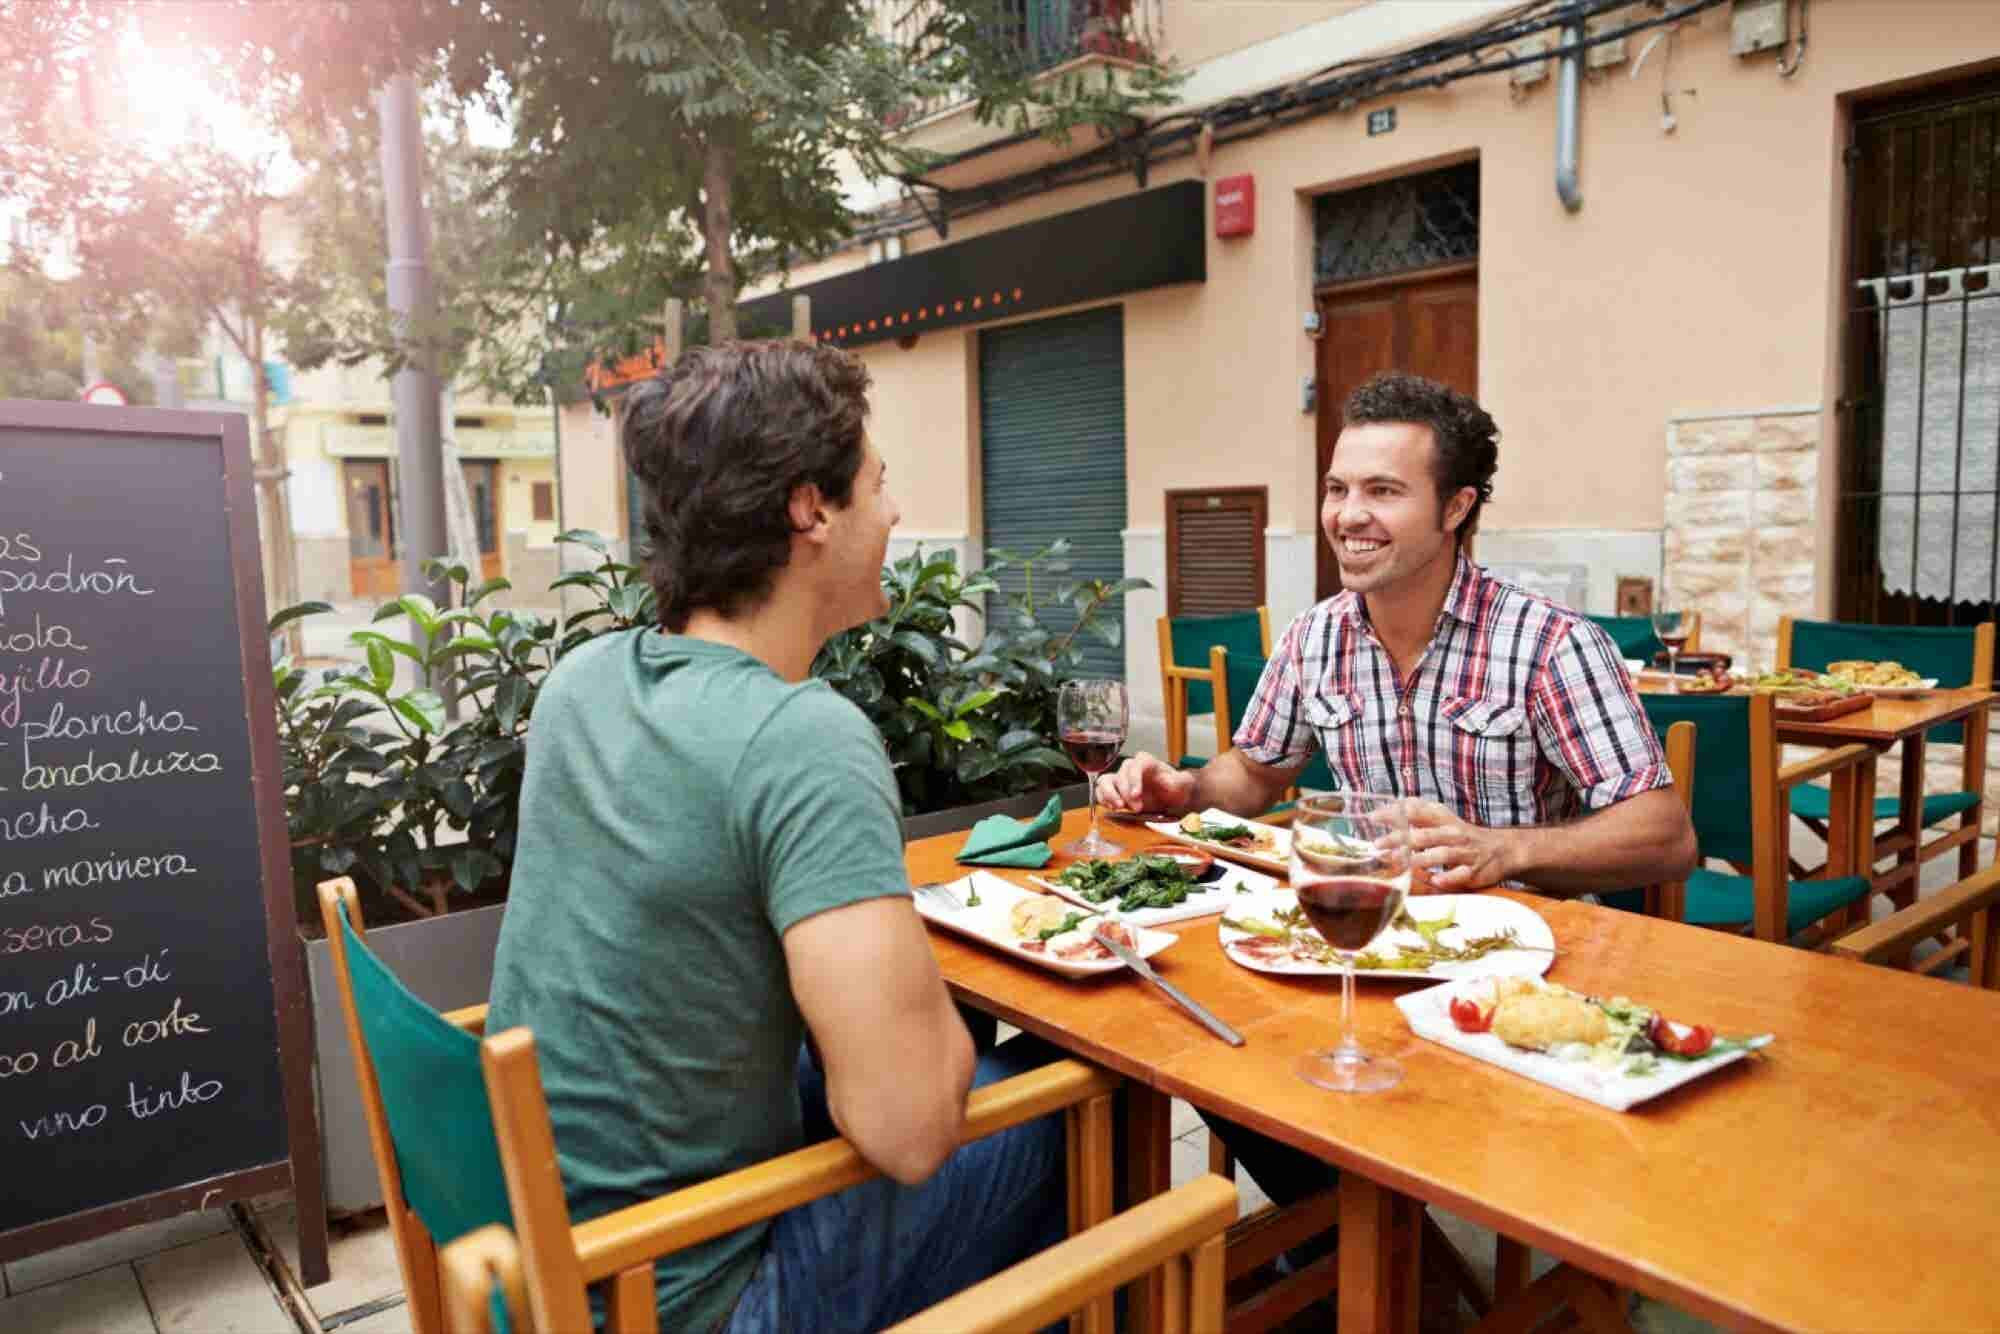 12 Simple Ways Restaurants Can Increase Revenue